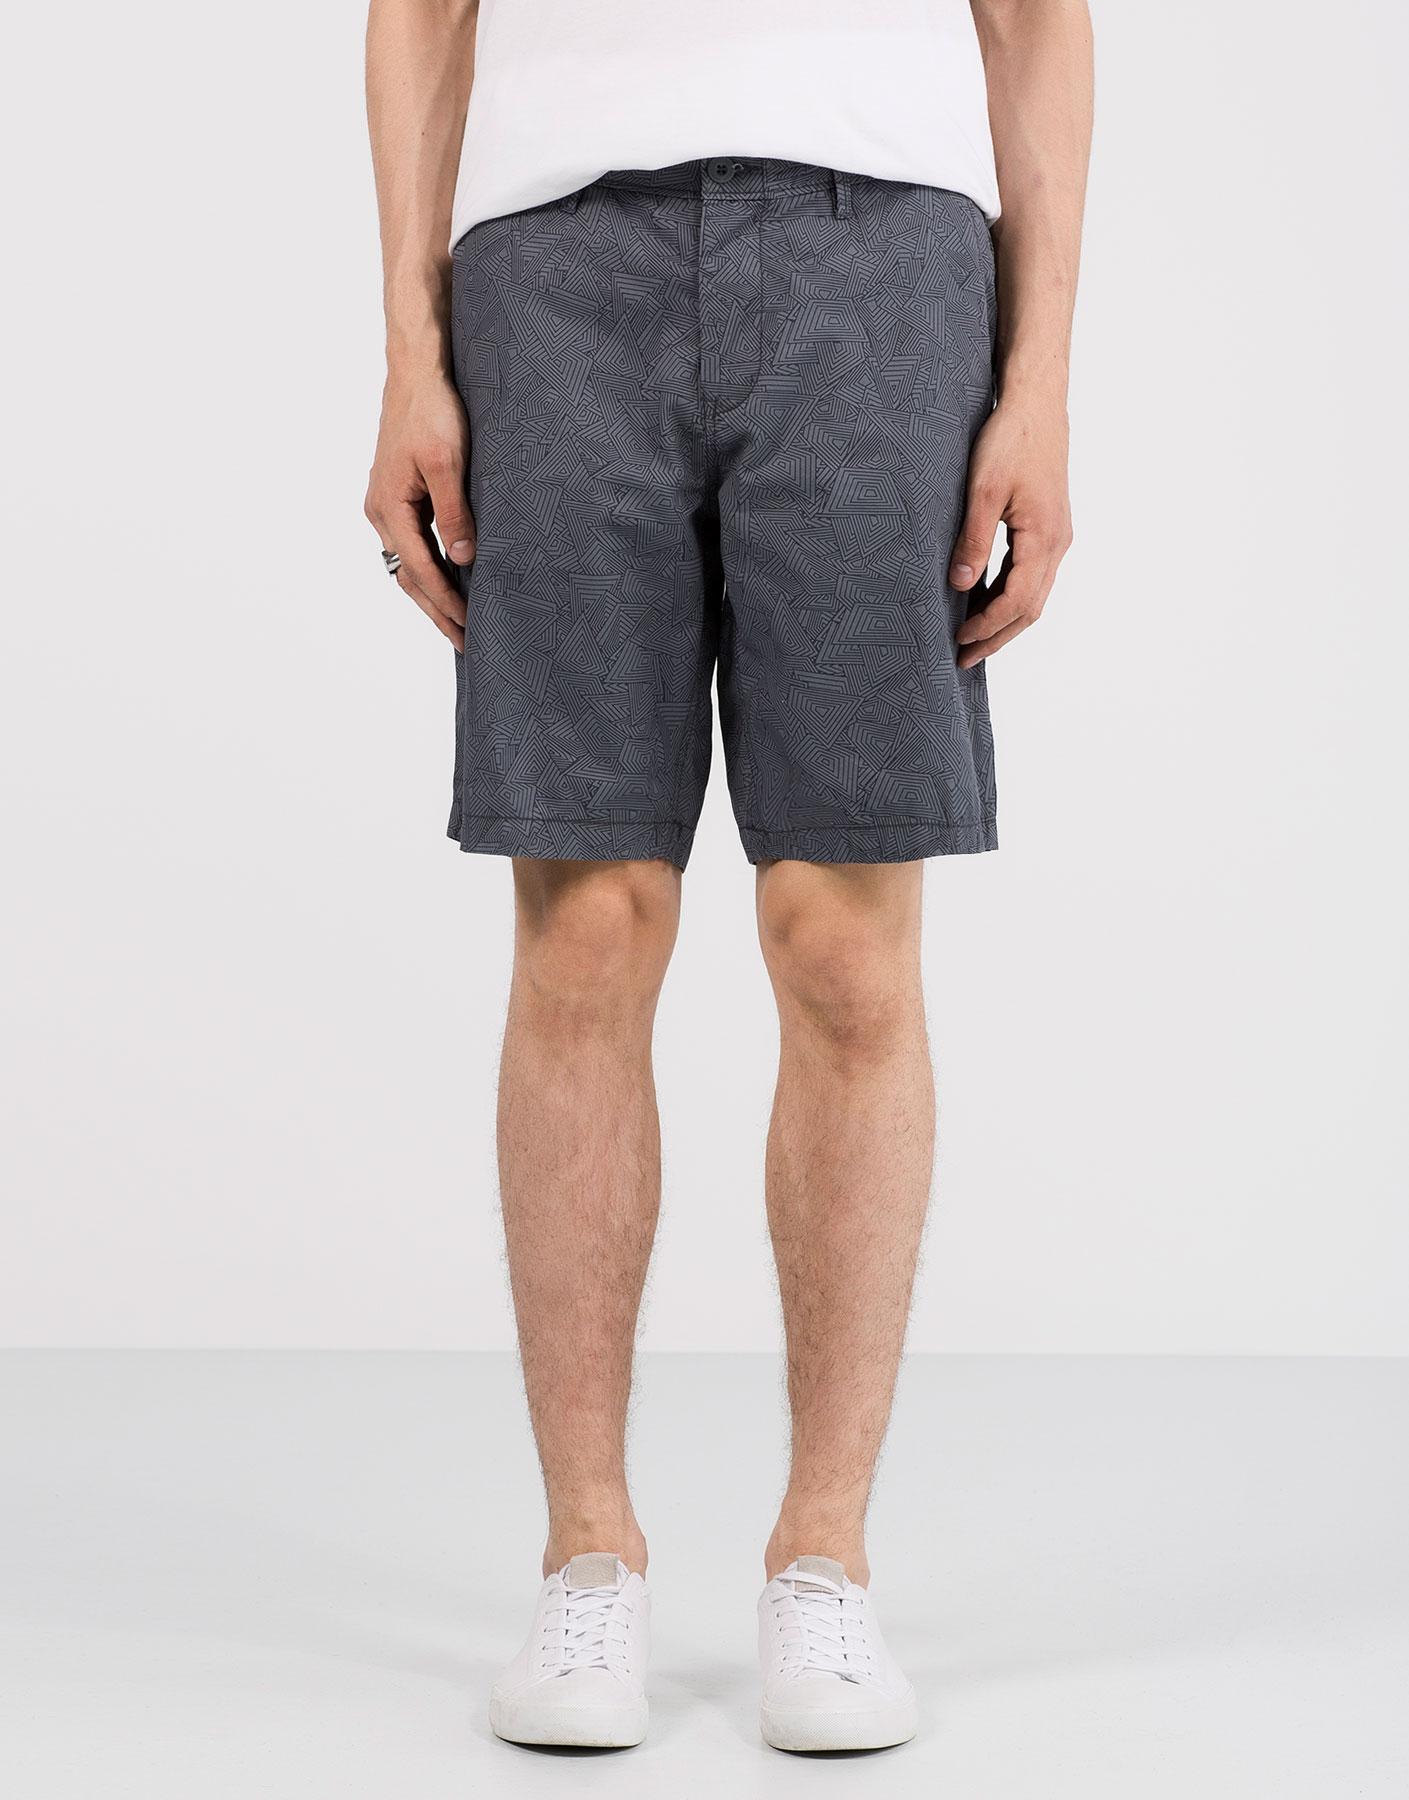 Bermudes tipus pantalons xinesos lleugeres